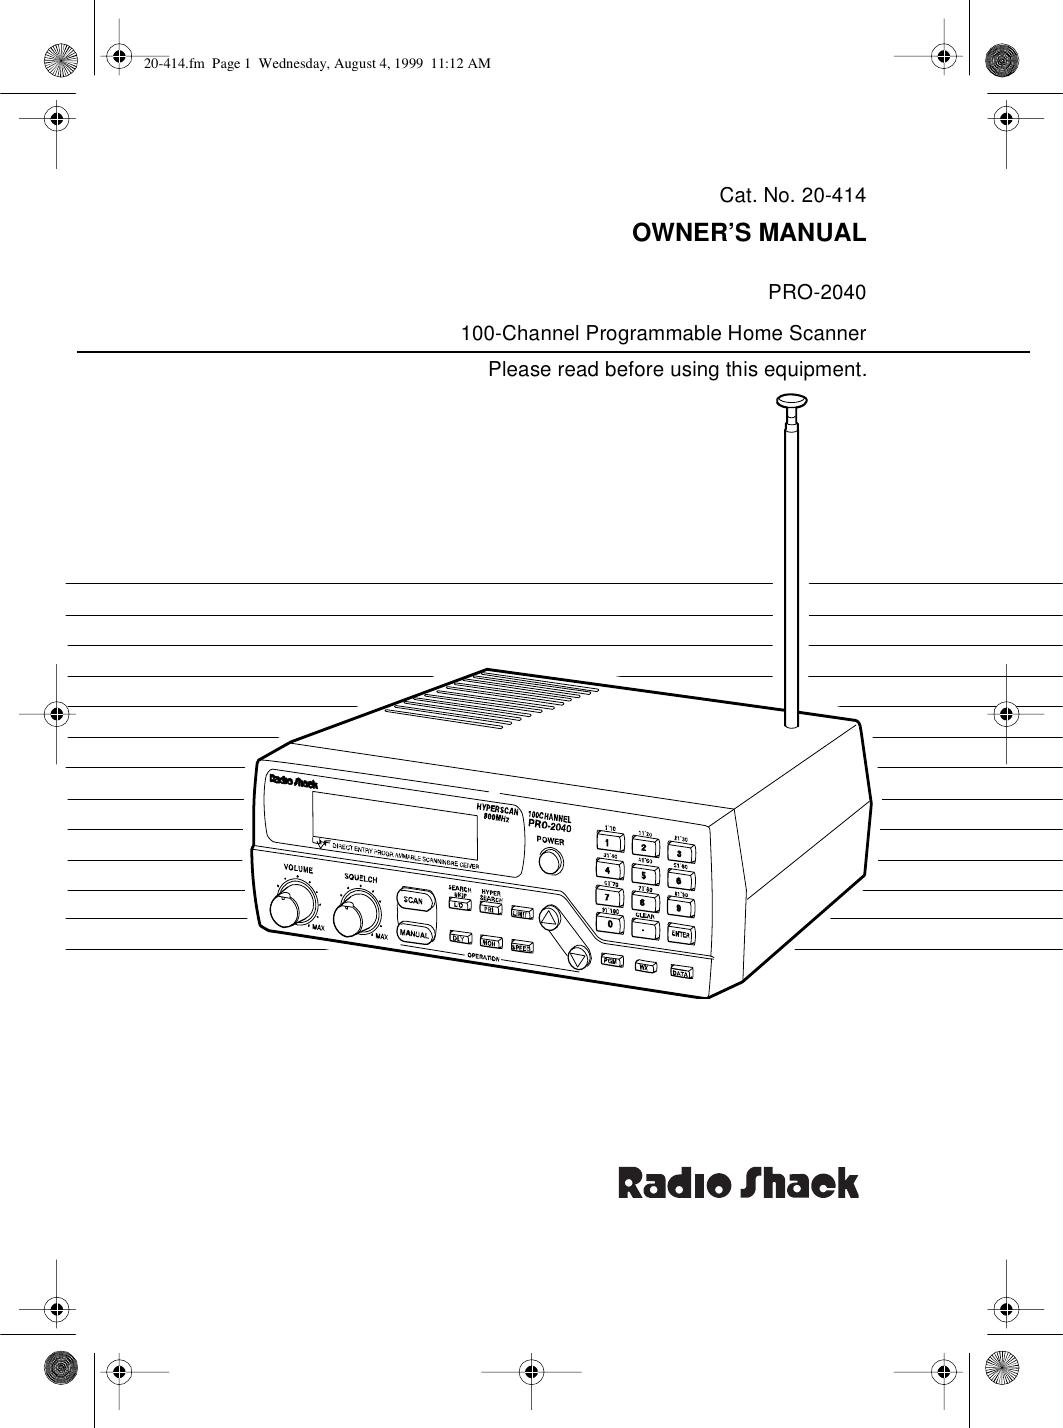 Radio Shack Pro 2040 Users Manual 20 414